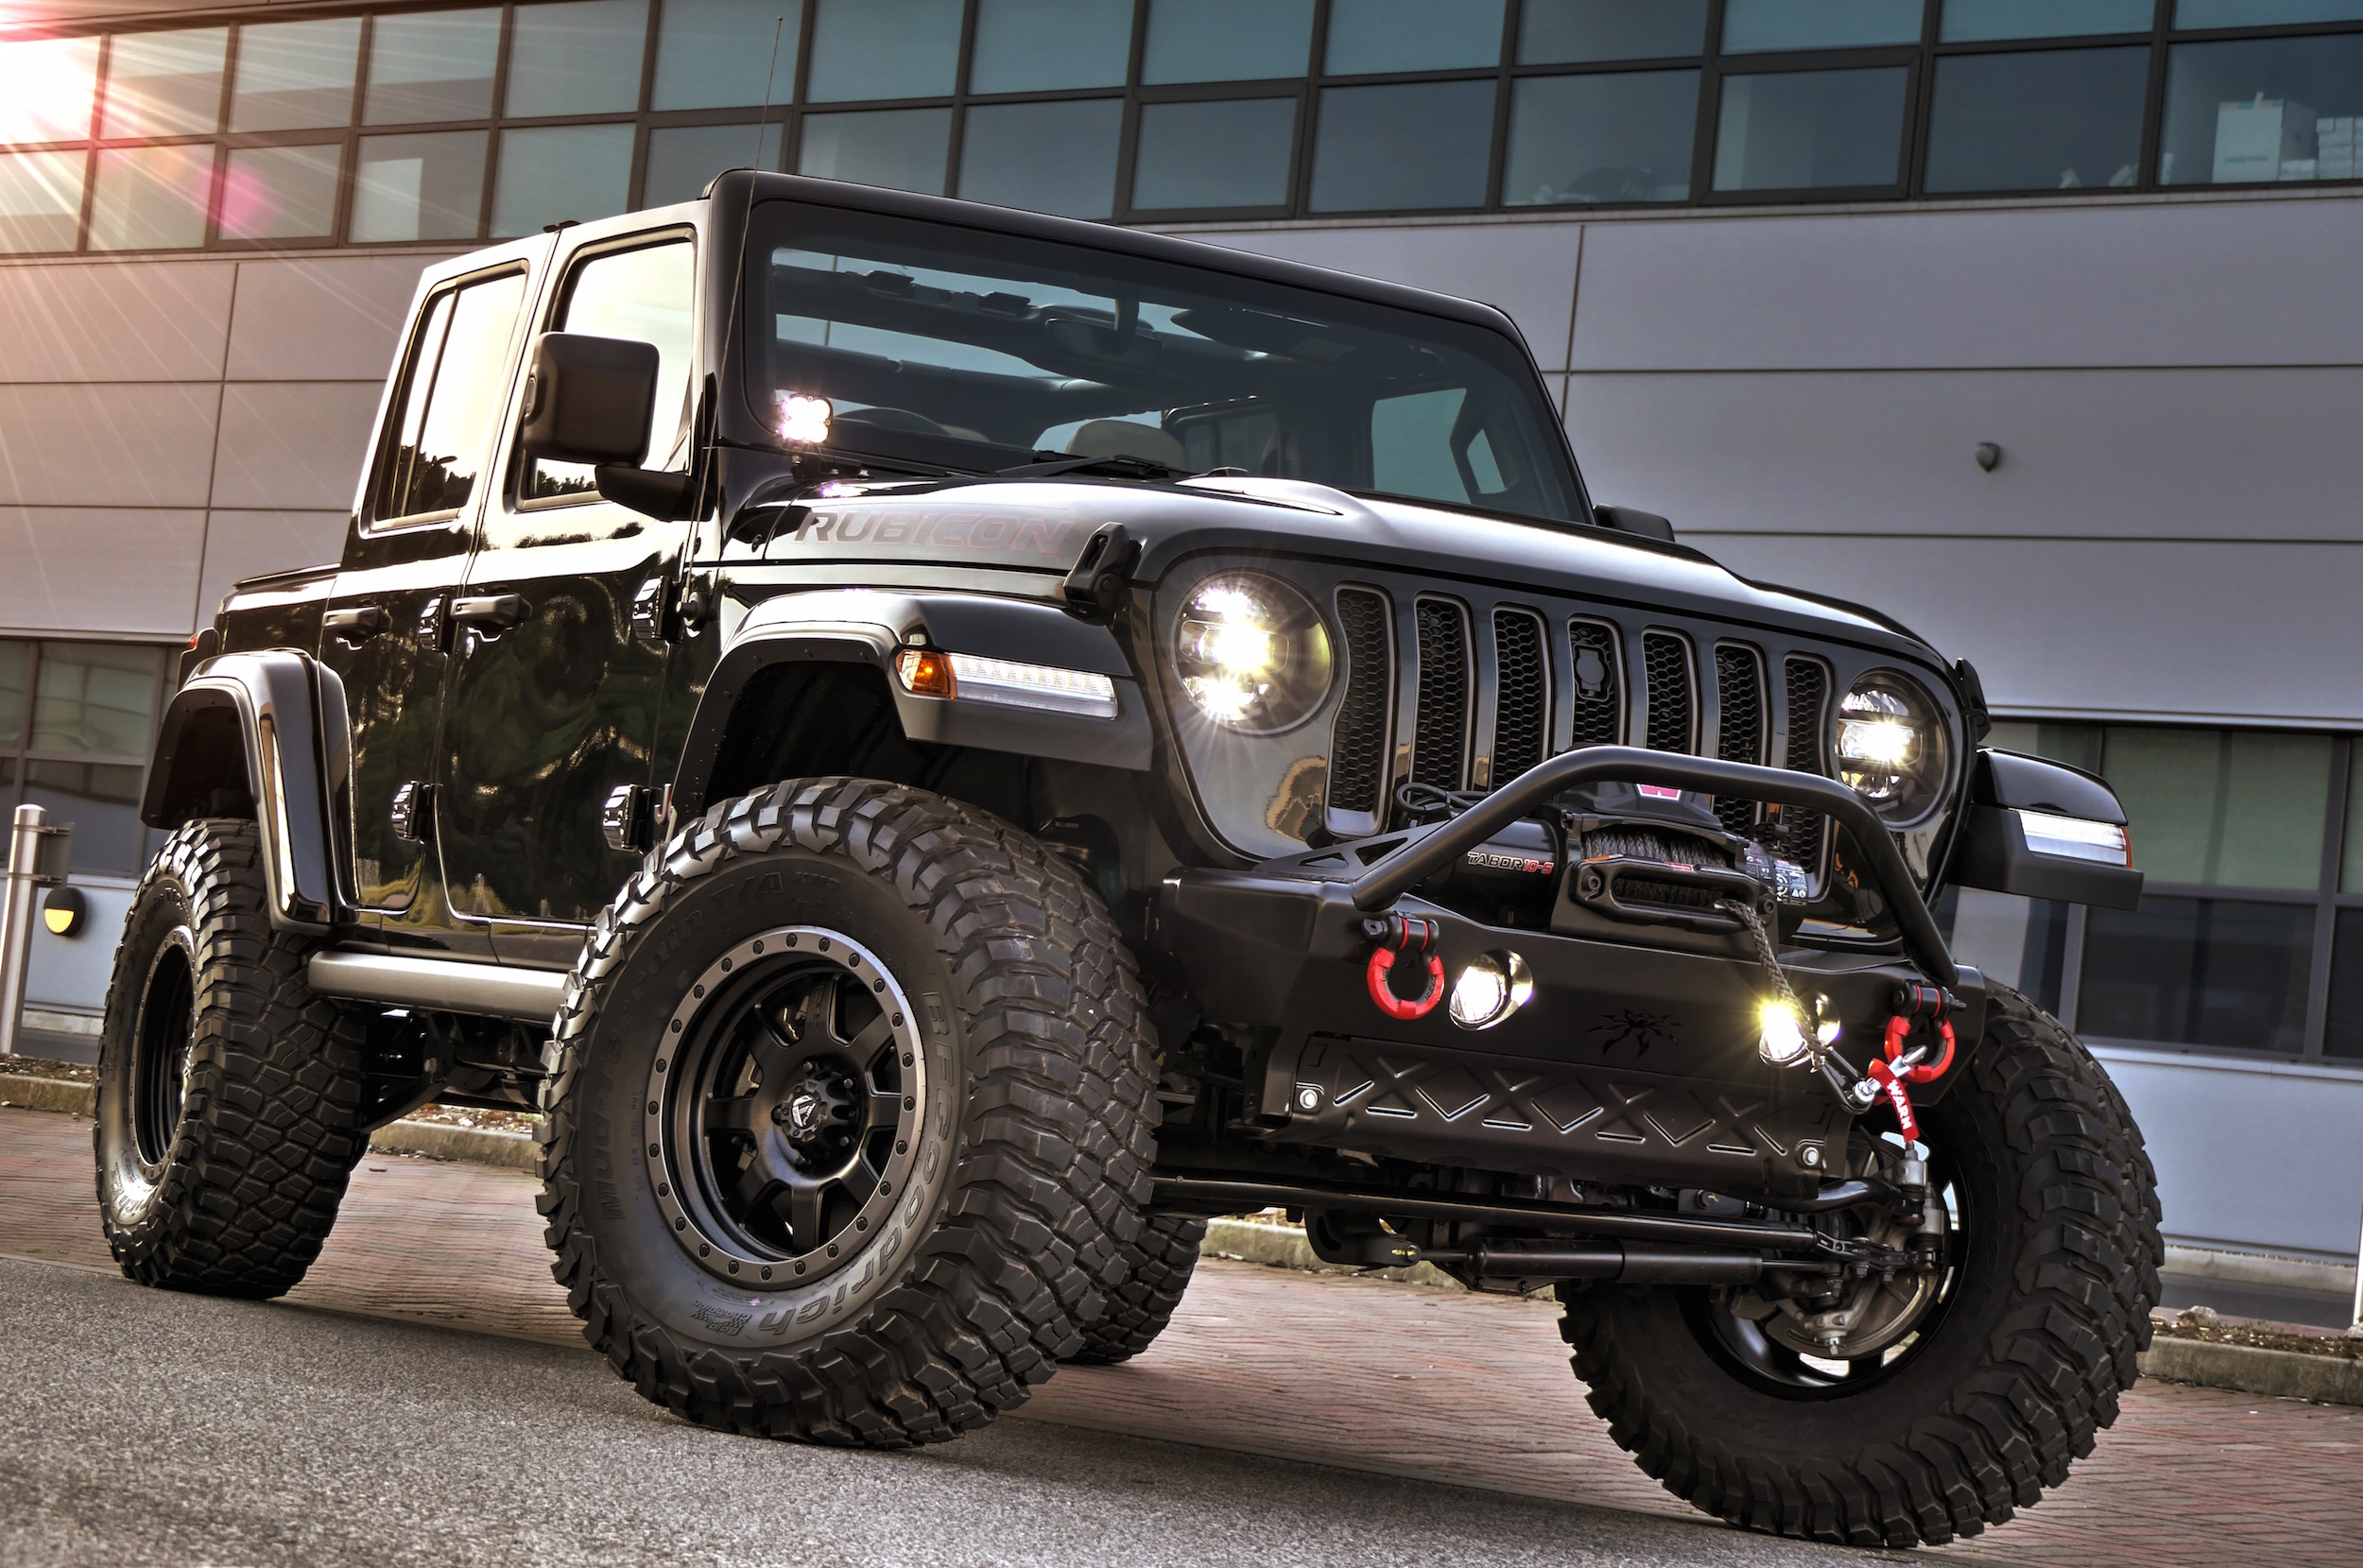 Used 2007 Jeep Wrangler Sahara For Sale ($16,995) | Select Jeeps Inc. Stock #133662